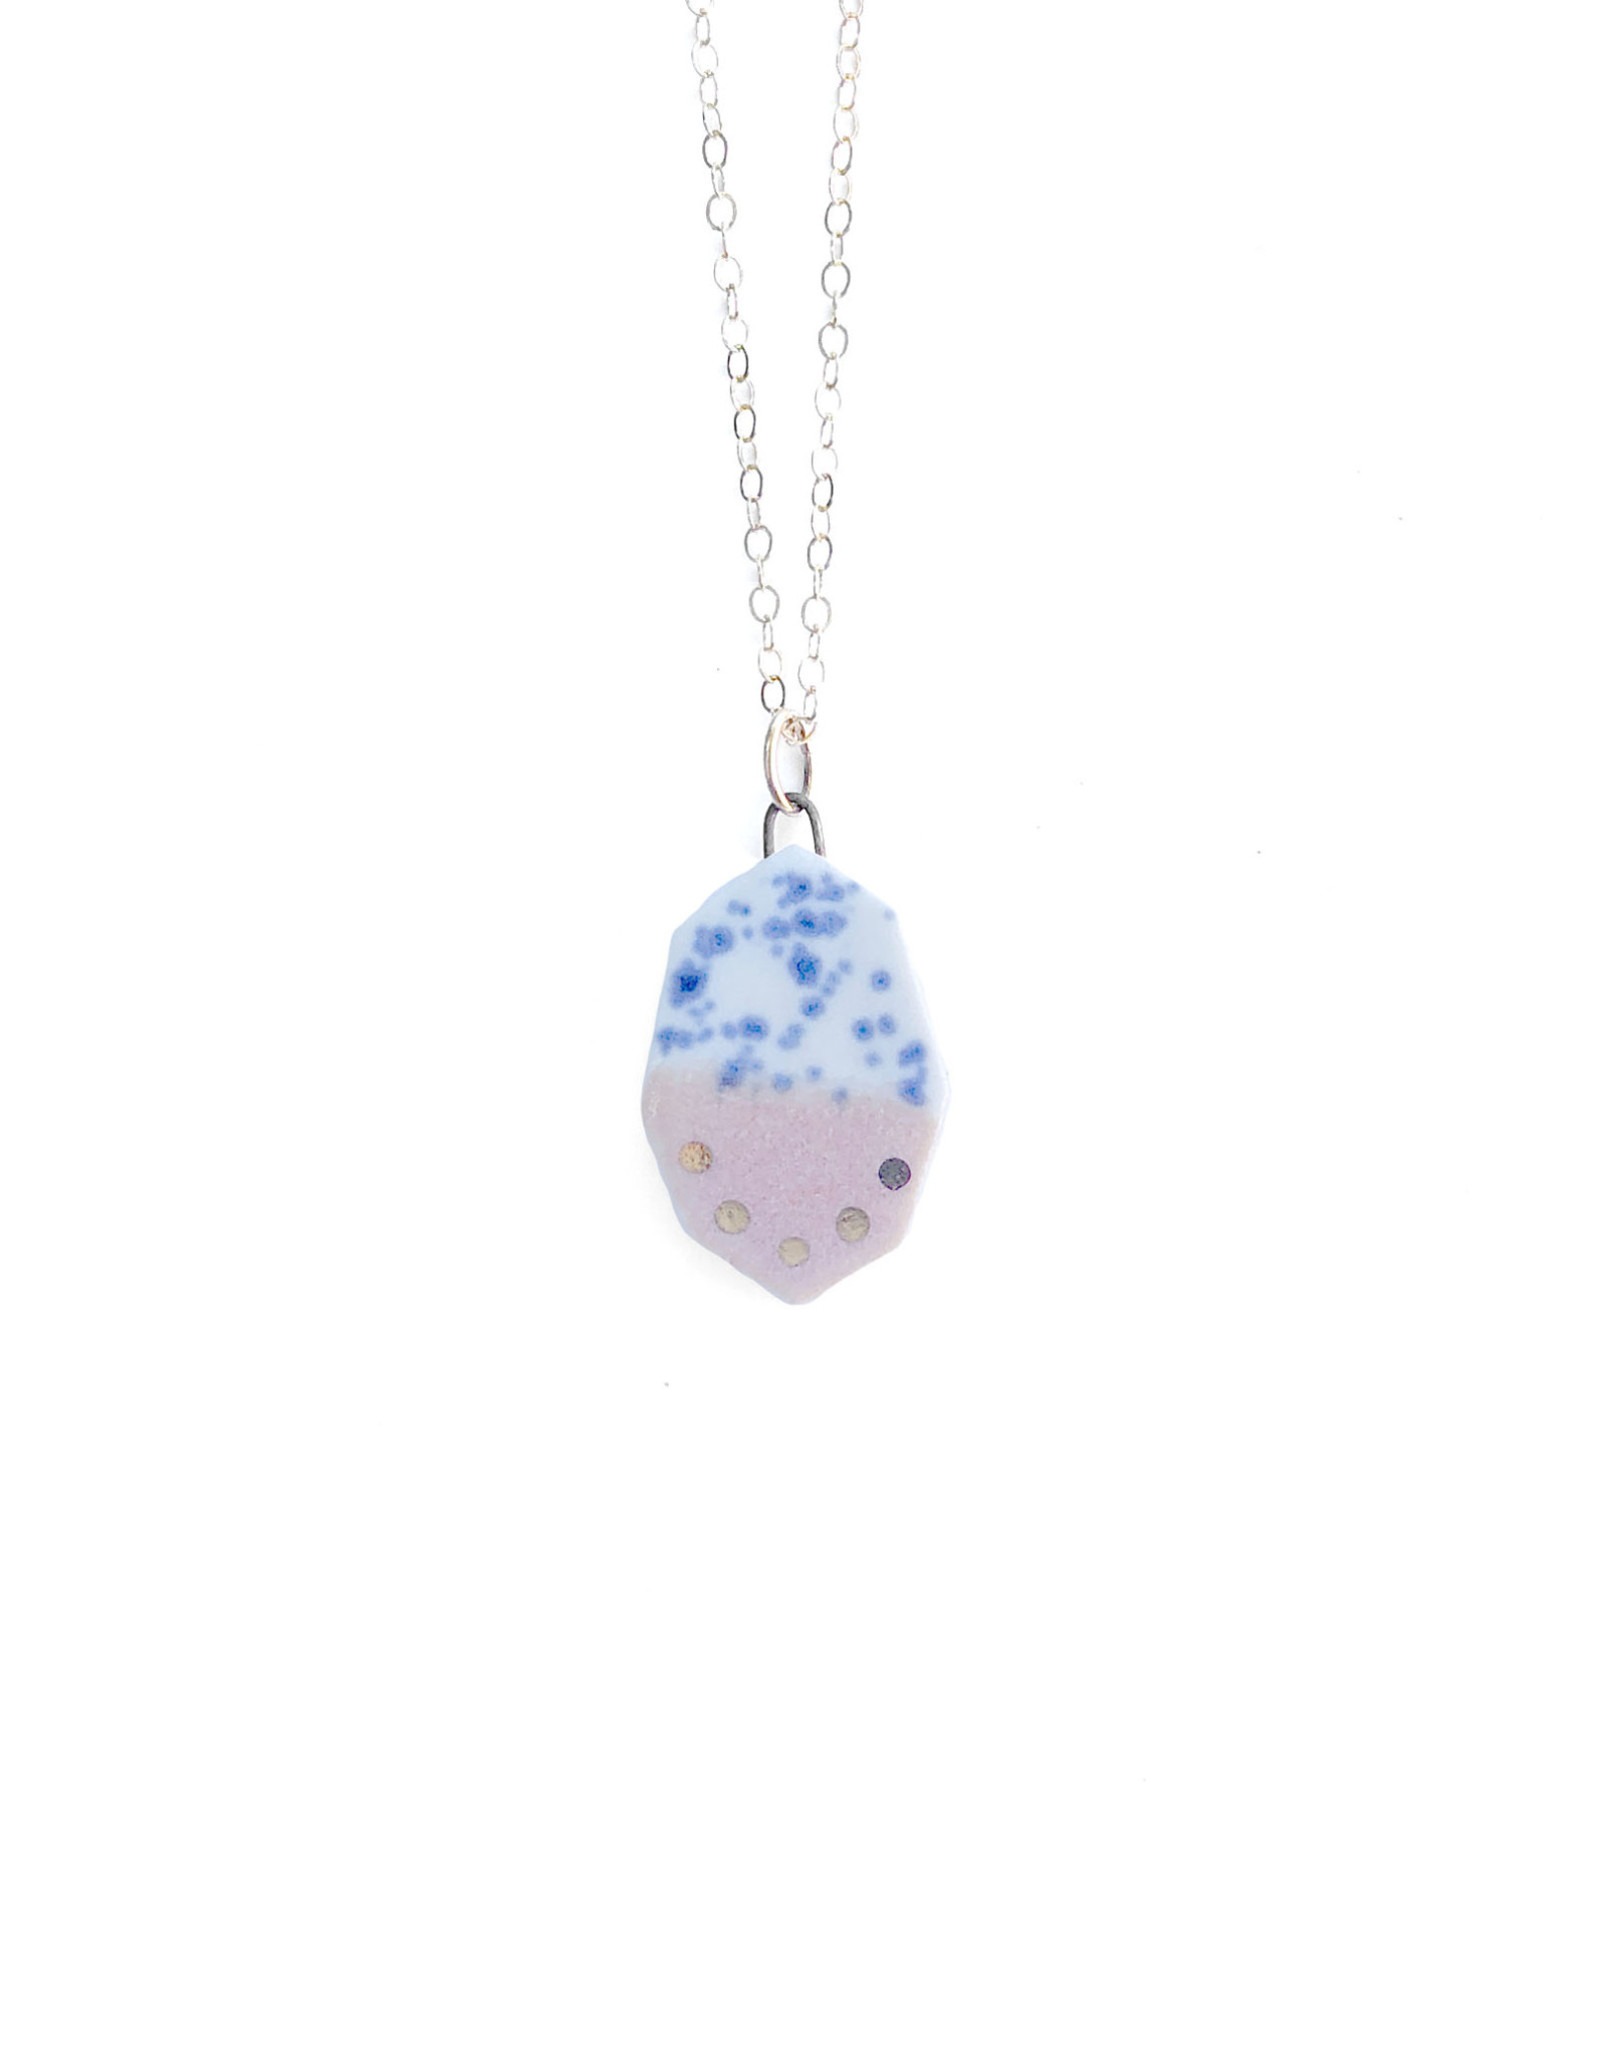 Small Geometric Necklace -  Gold/Rhubarb/Blue Splatter